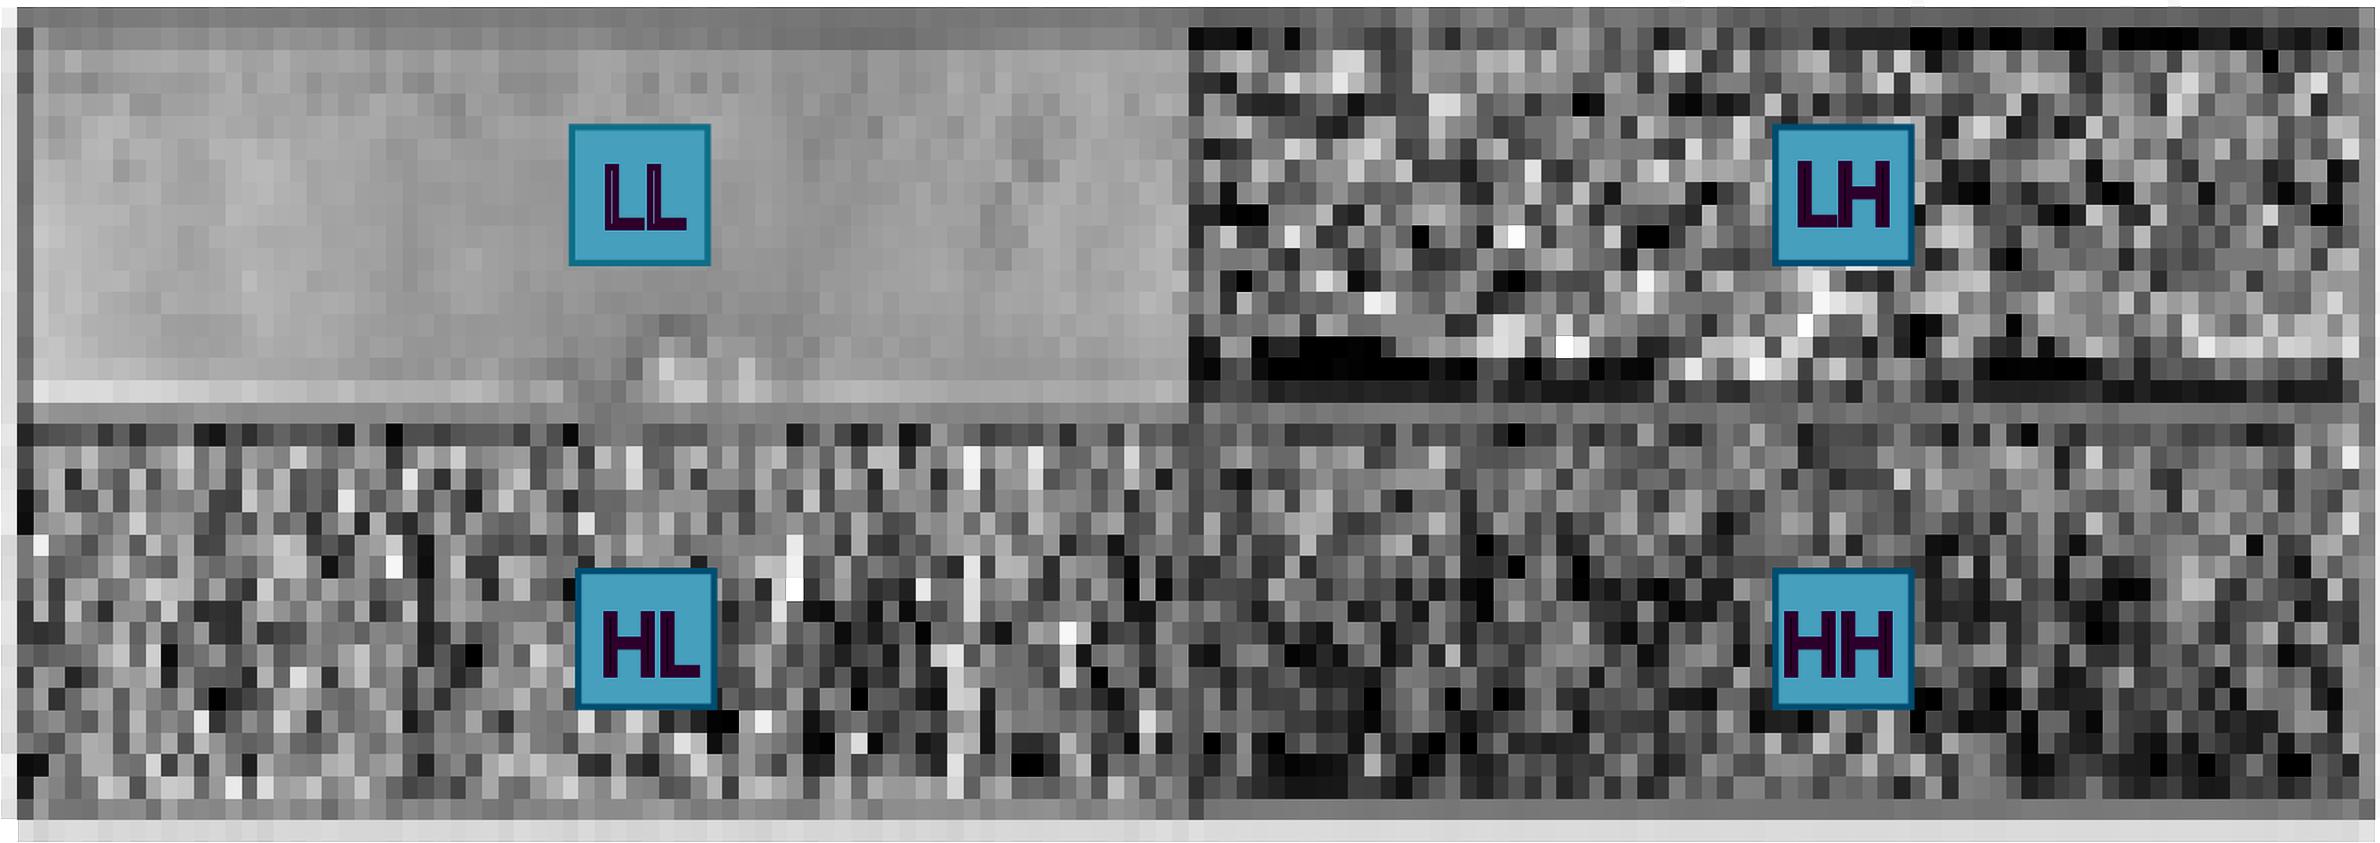 A fast iris recognition system through optimum feature